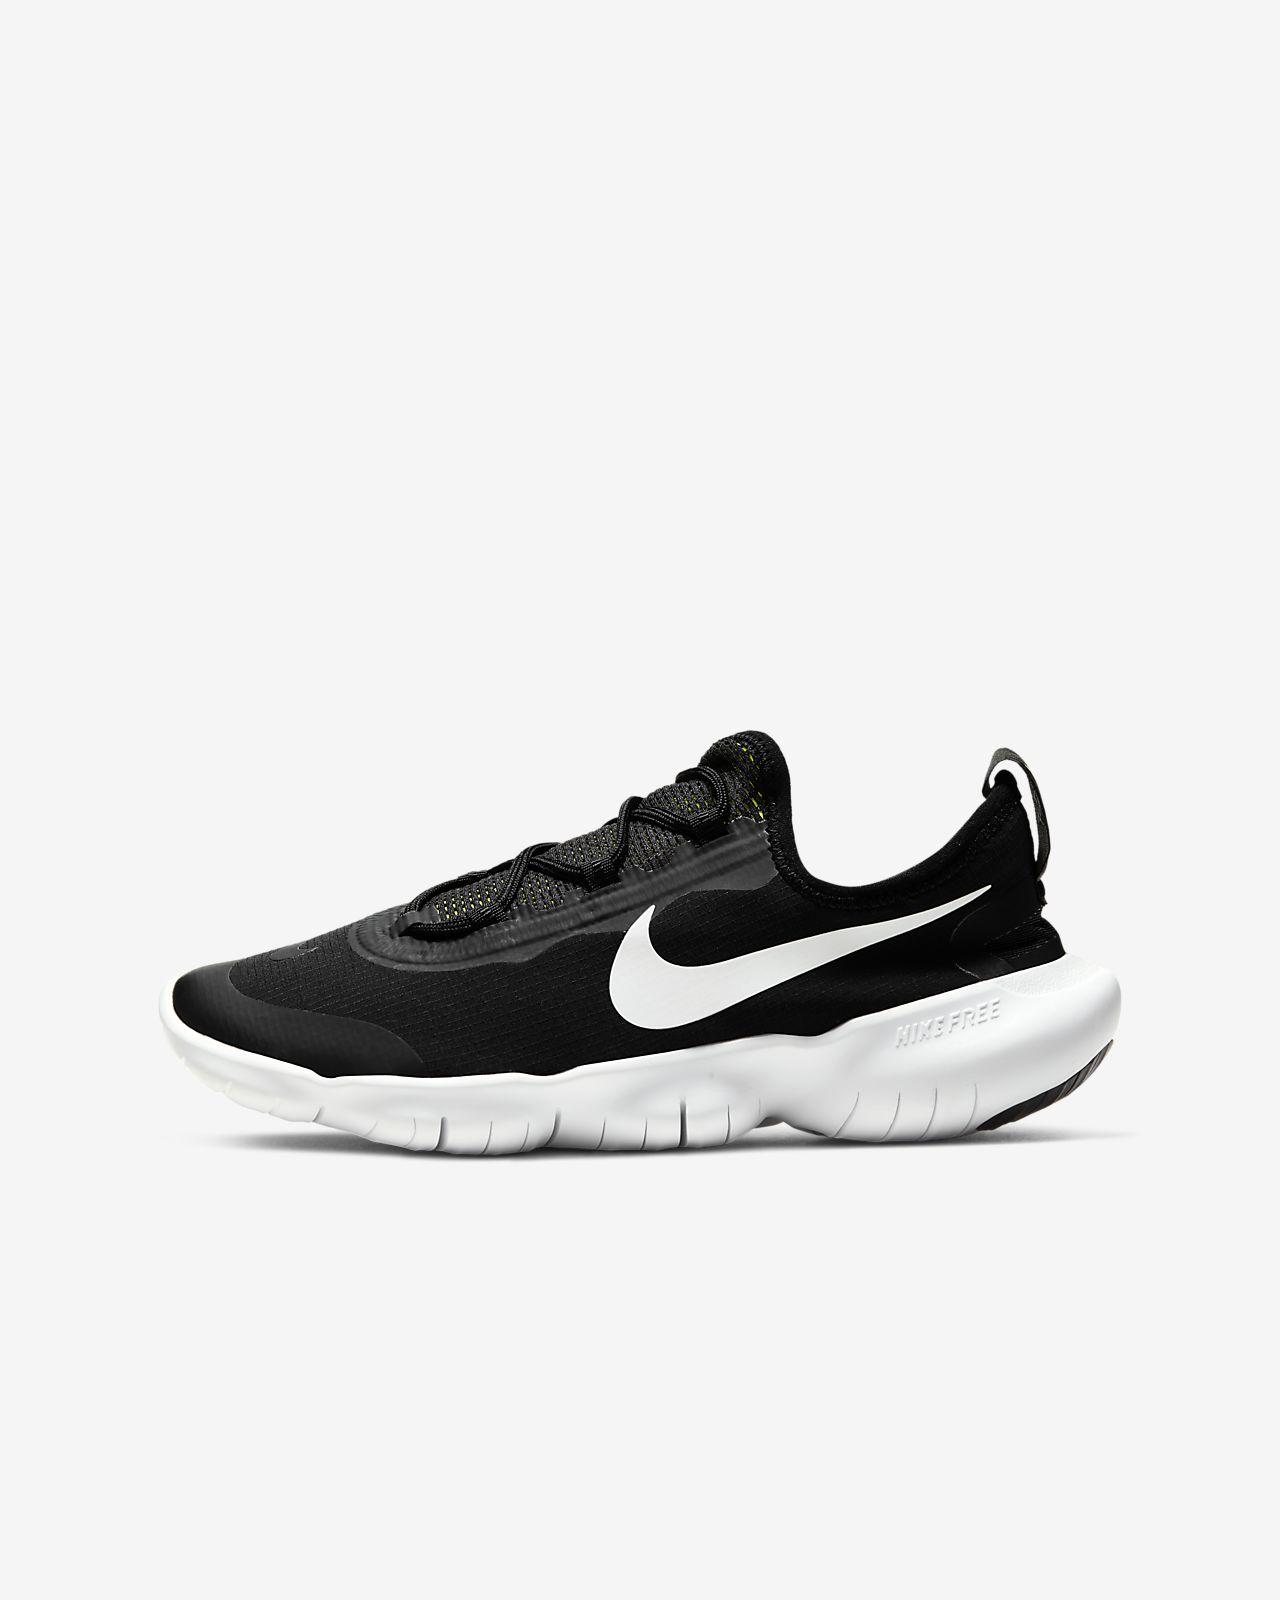 Nike Boys Free 5.0 Running Shoes